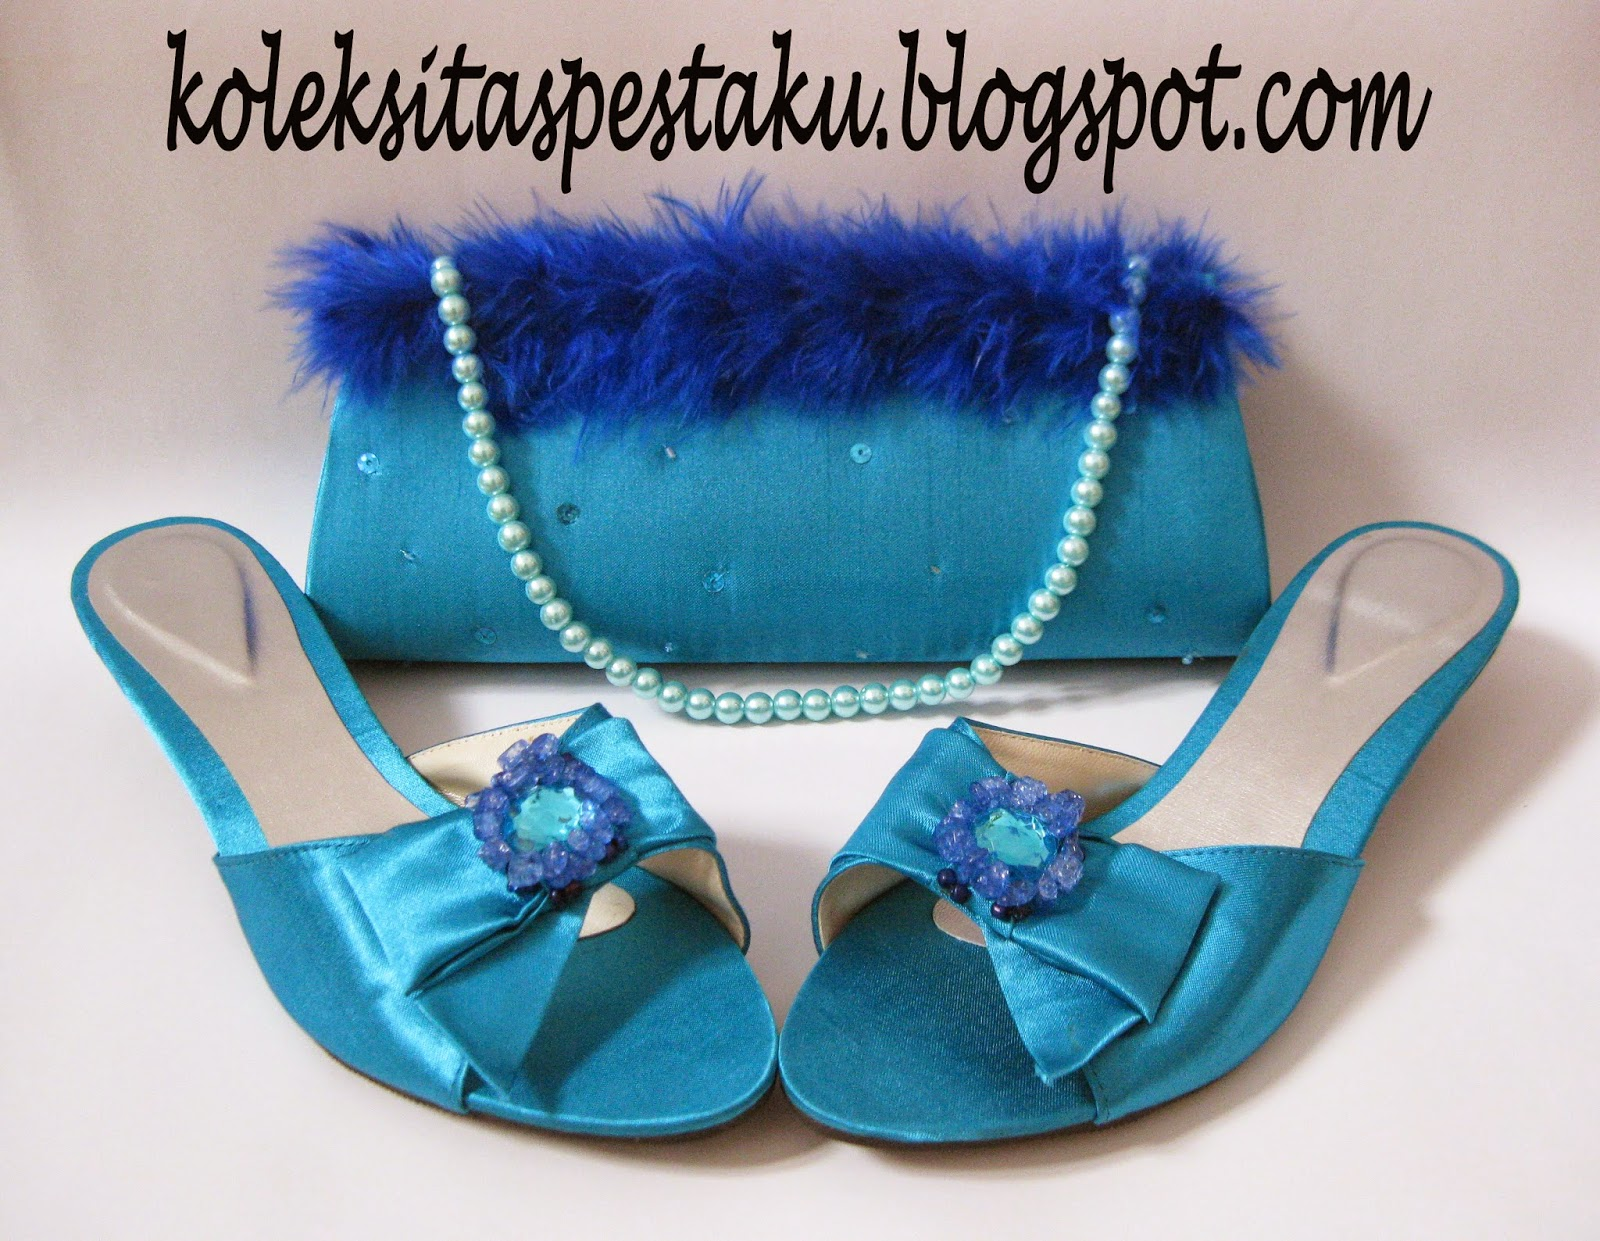 Tas Pesta dan Sepatu Pesta Biru Tosca Bulu Cantik